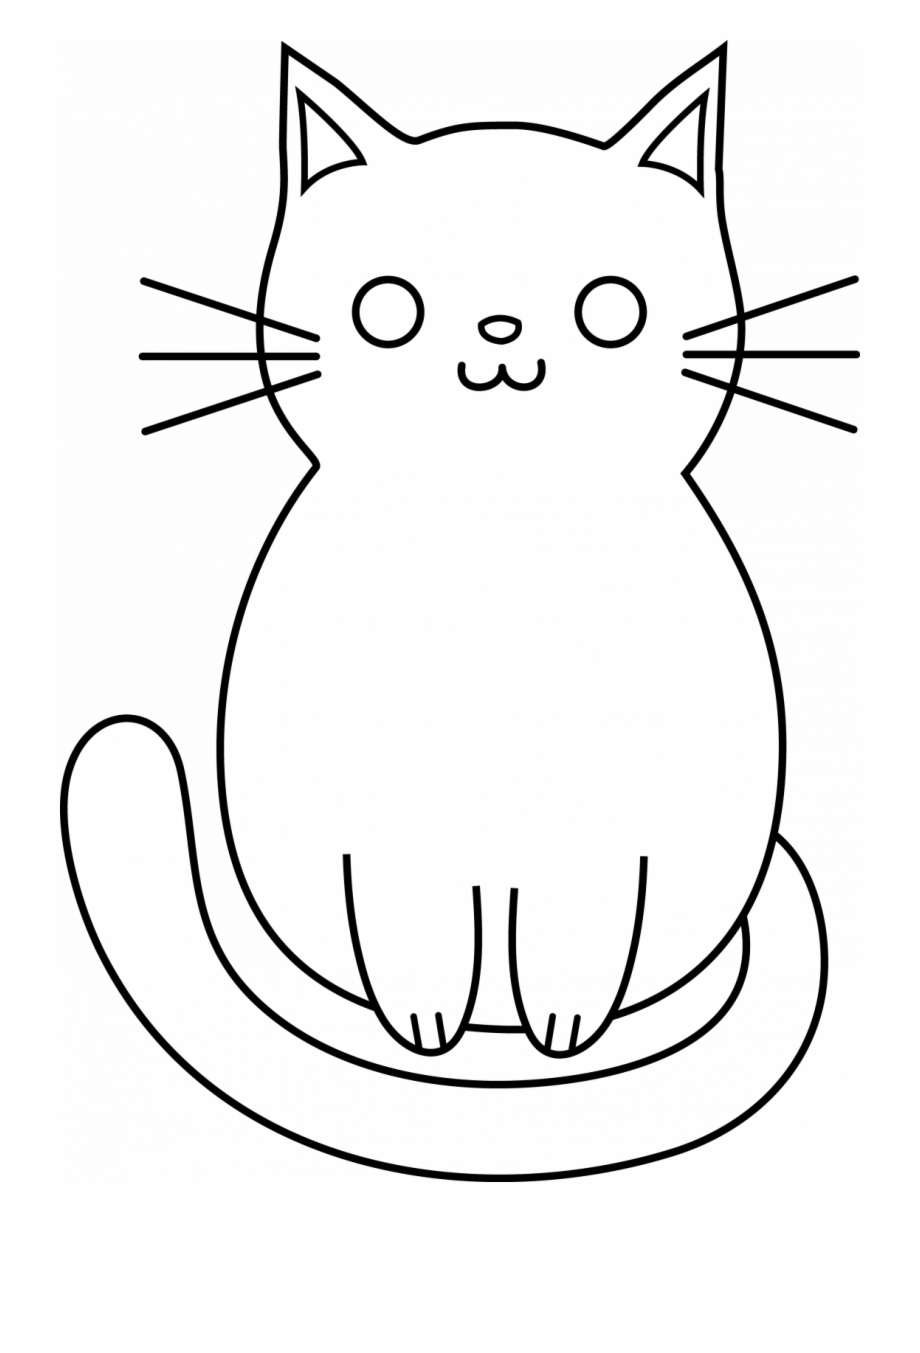 How To Draw A Cat Head Eye Cute Cartoon Easy Draw Cats